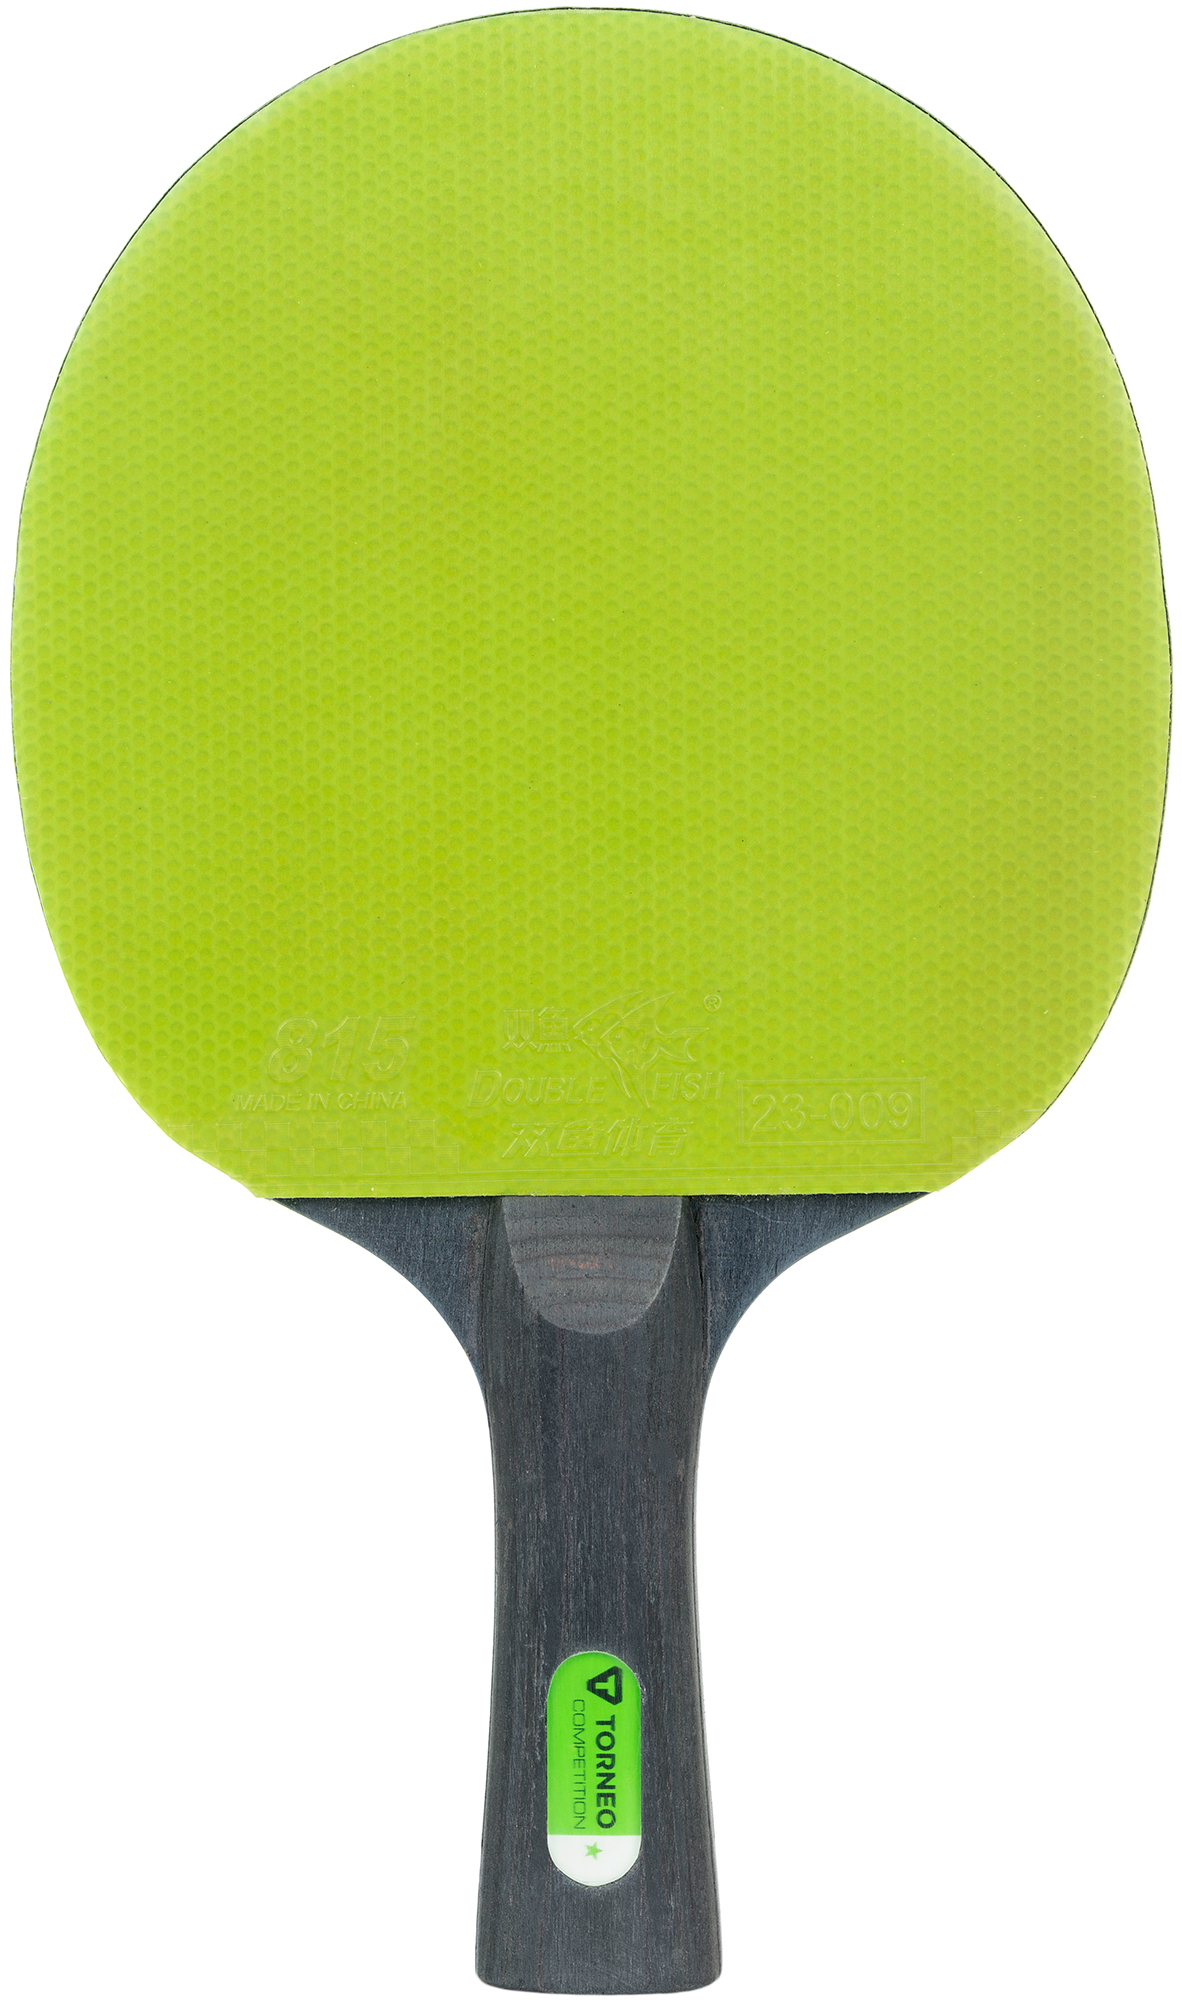 Torneo Ракетка для настольного тенниса Torneo Competition, размер Без размера цена 2017